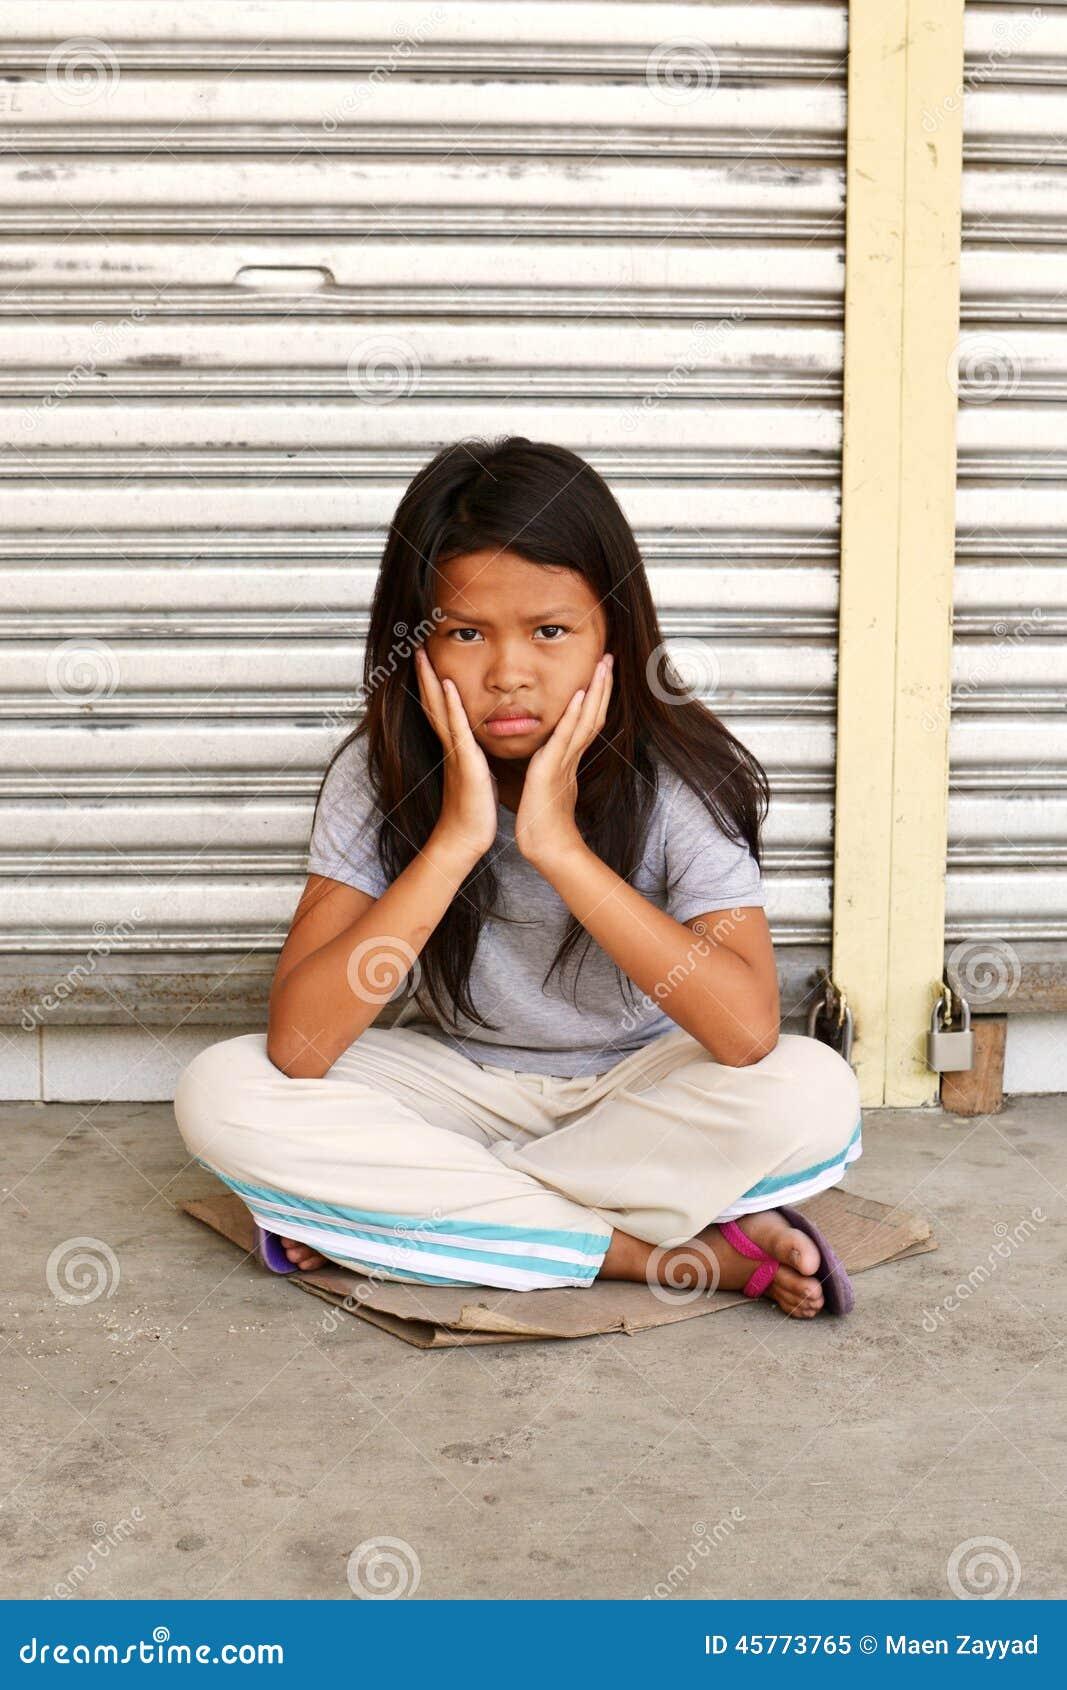 Sad Cute Homeless Child Stock Photo - Image: 45773765